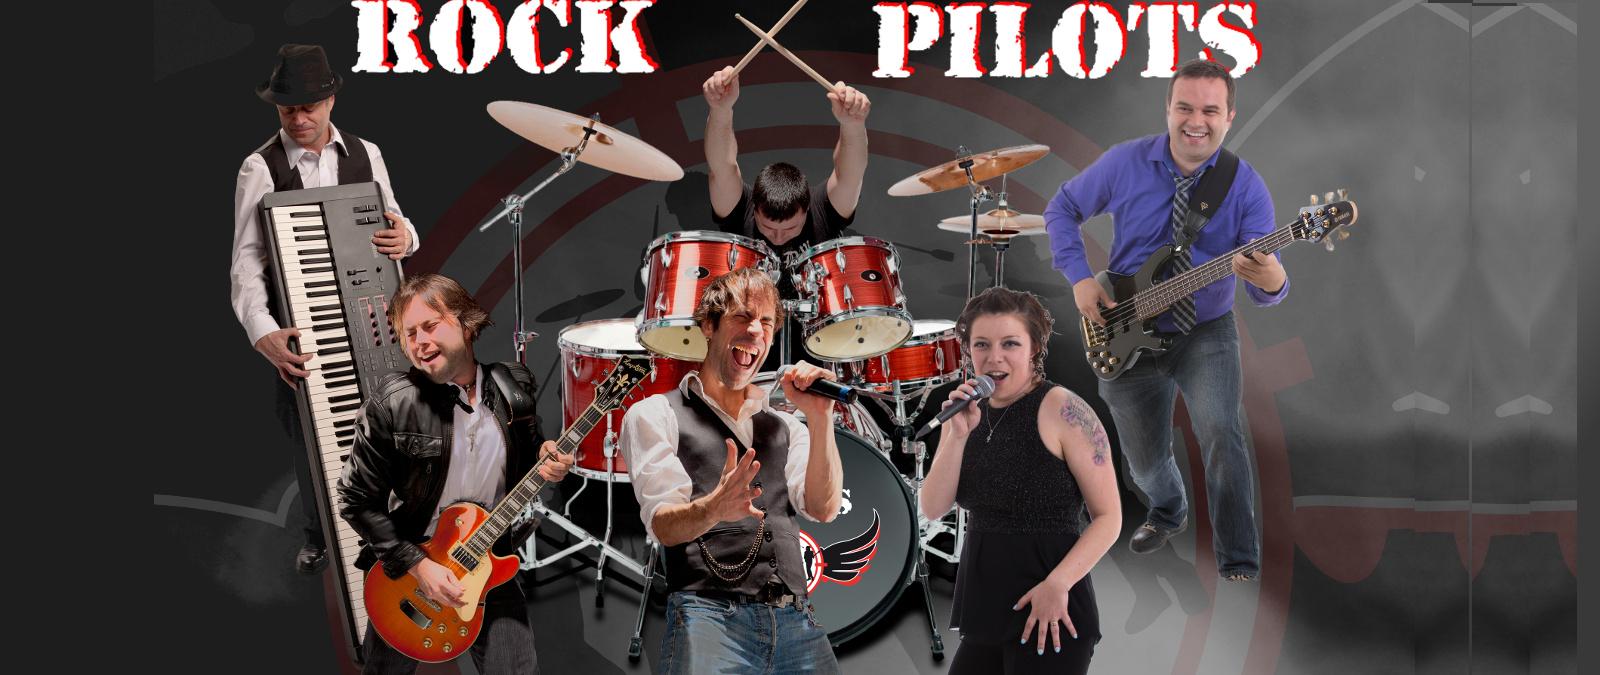 slider_rockpilots_web5